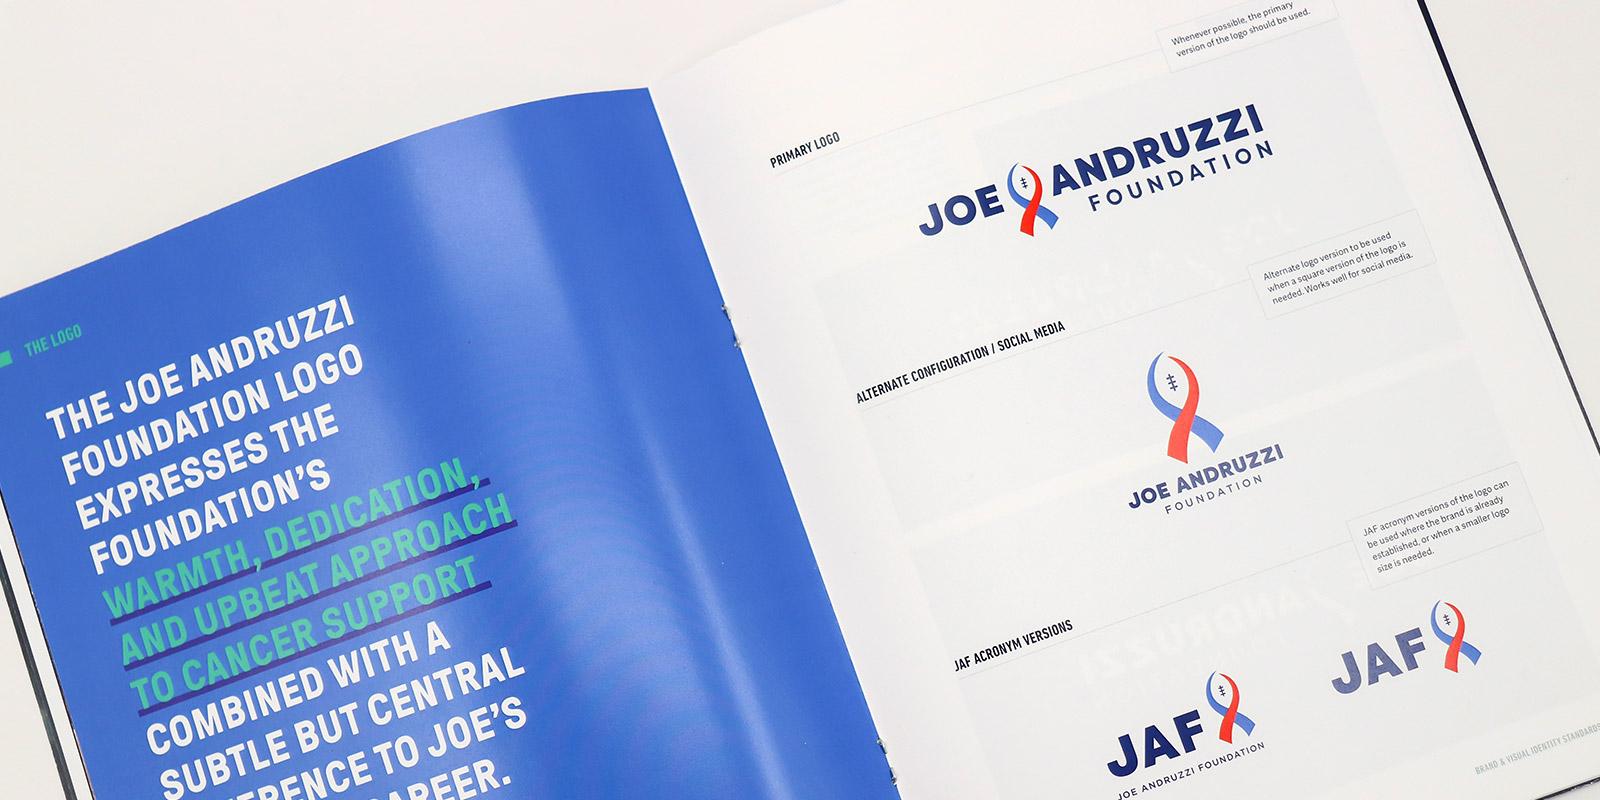 Joe Andruzzi Foundation logo design